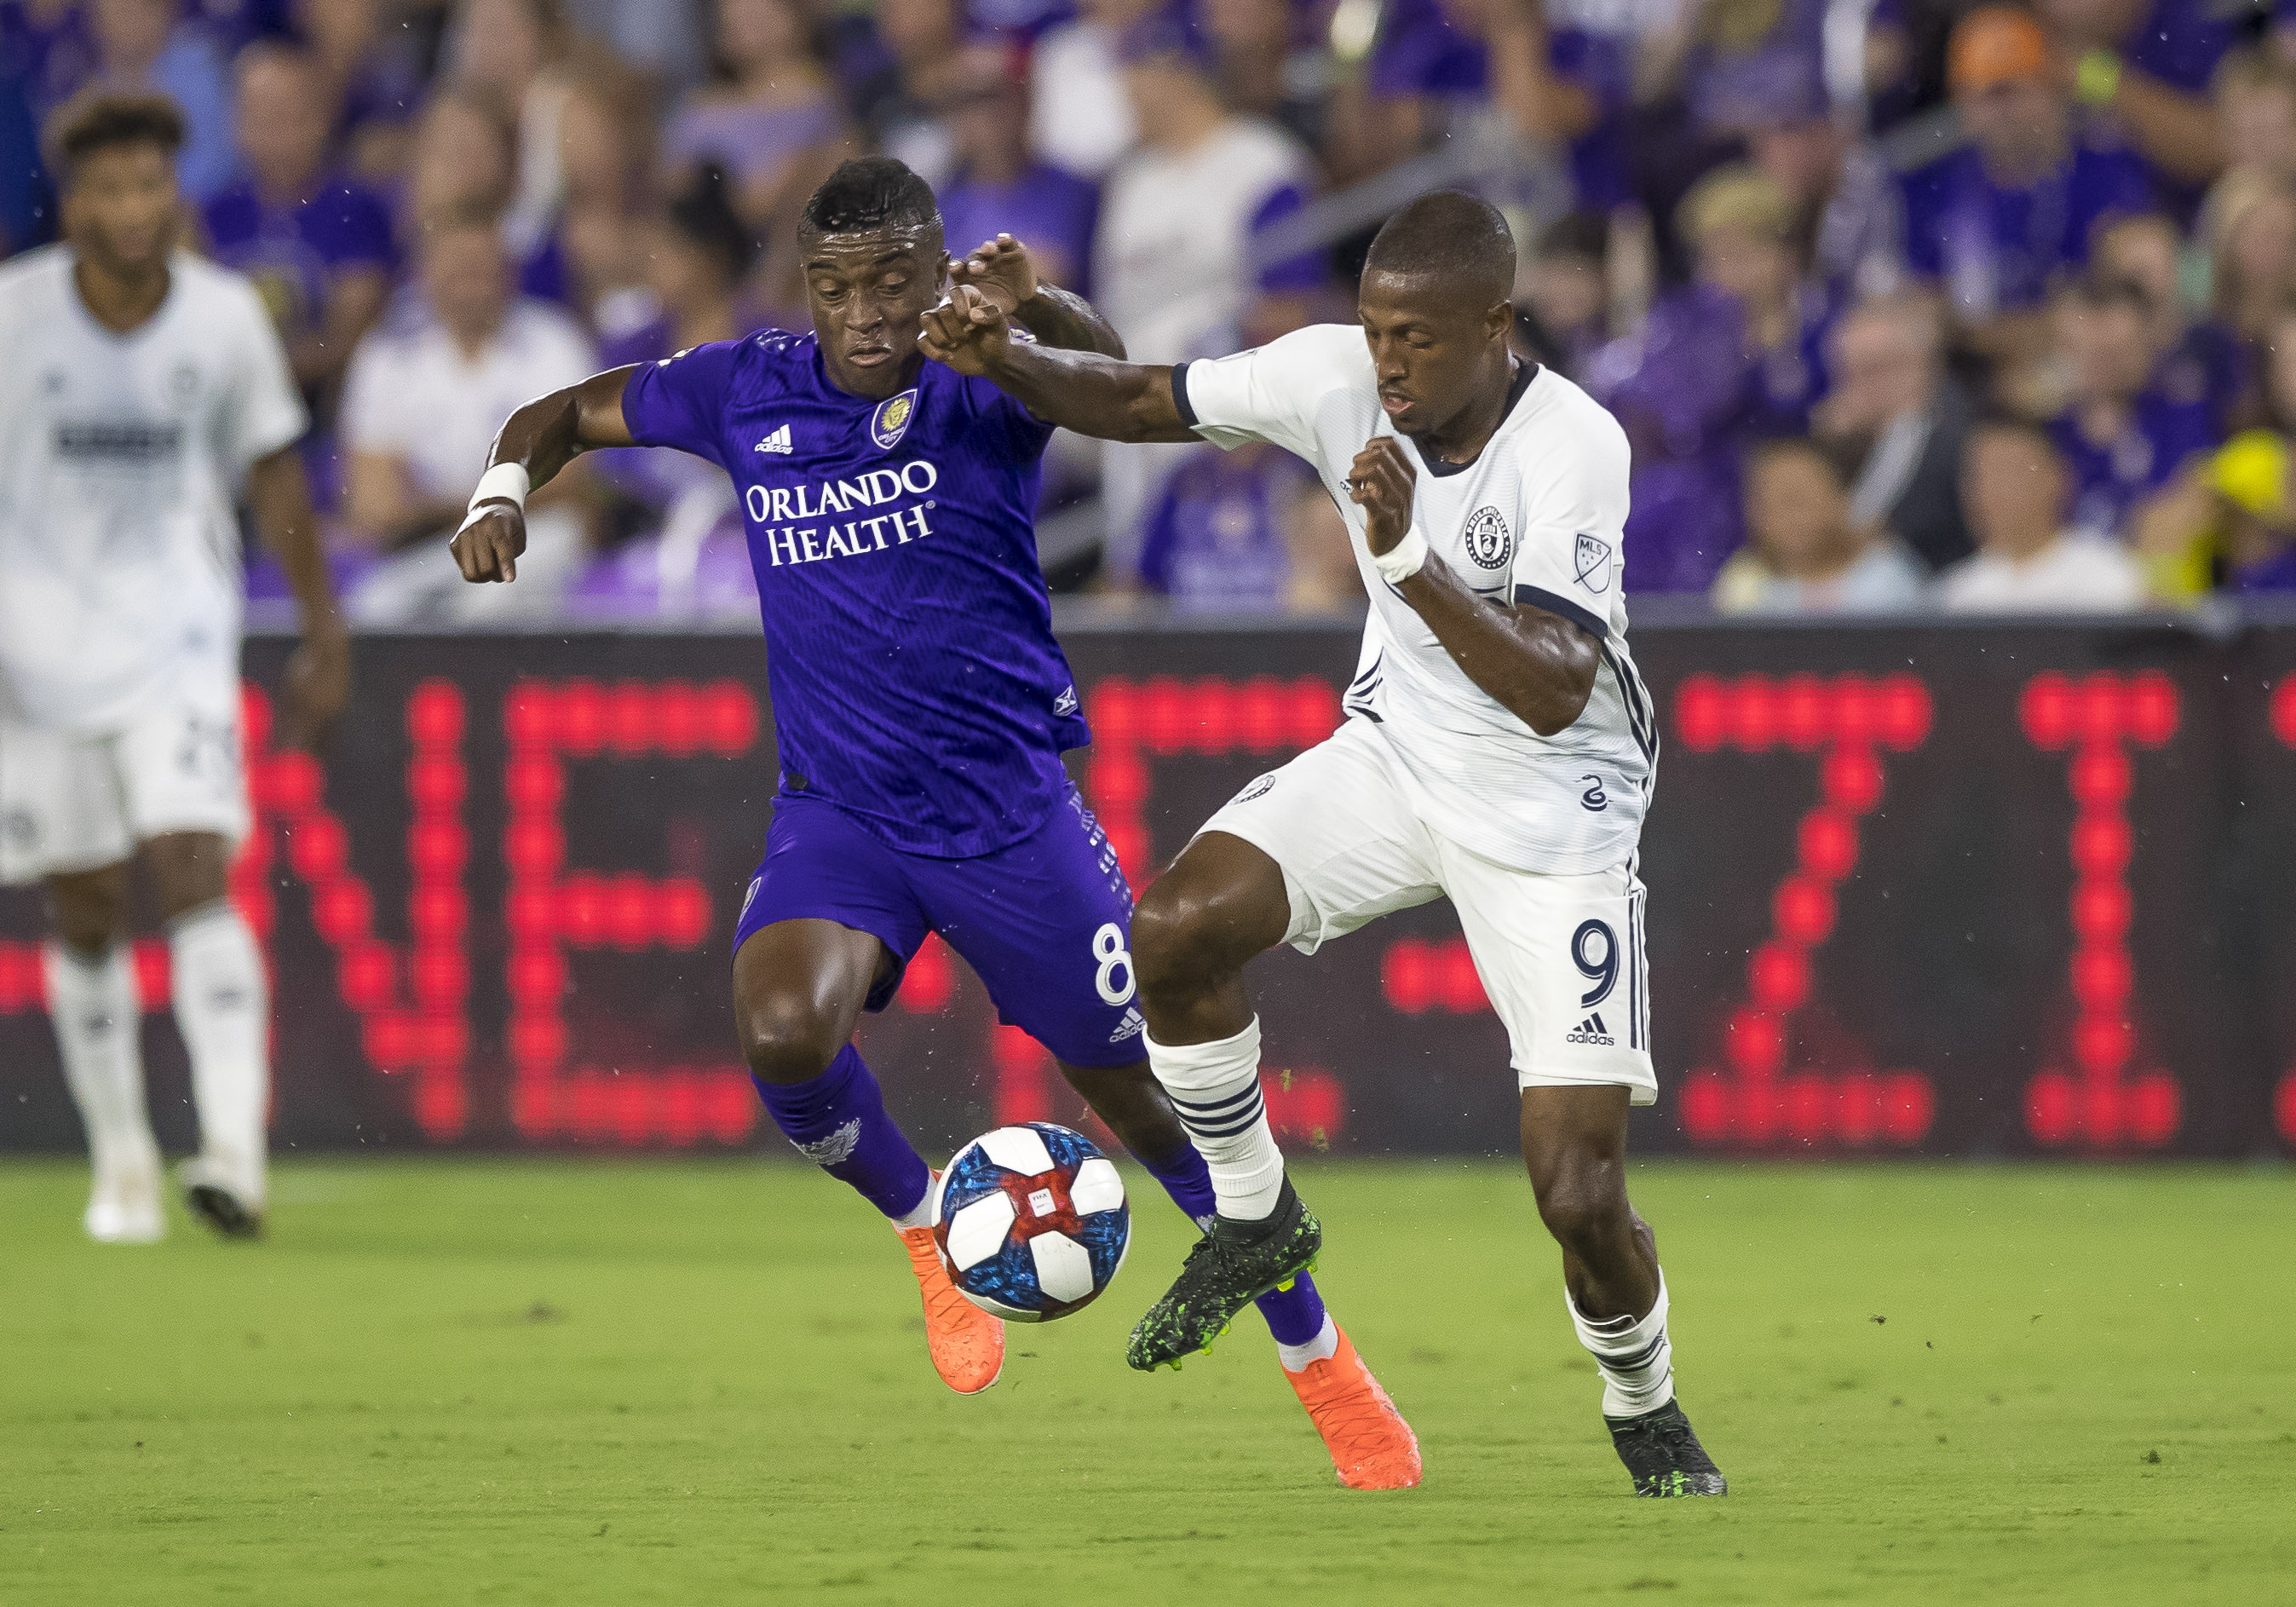 SOCCER: JUL 03 MLS - Philadelphia Union at Orlando City SC